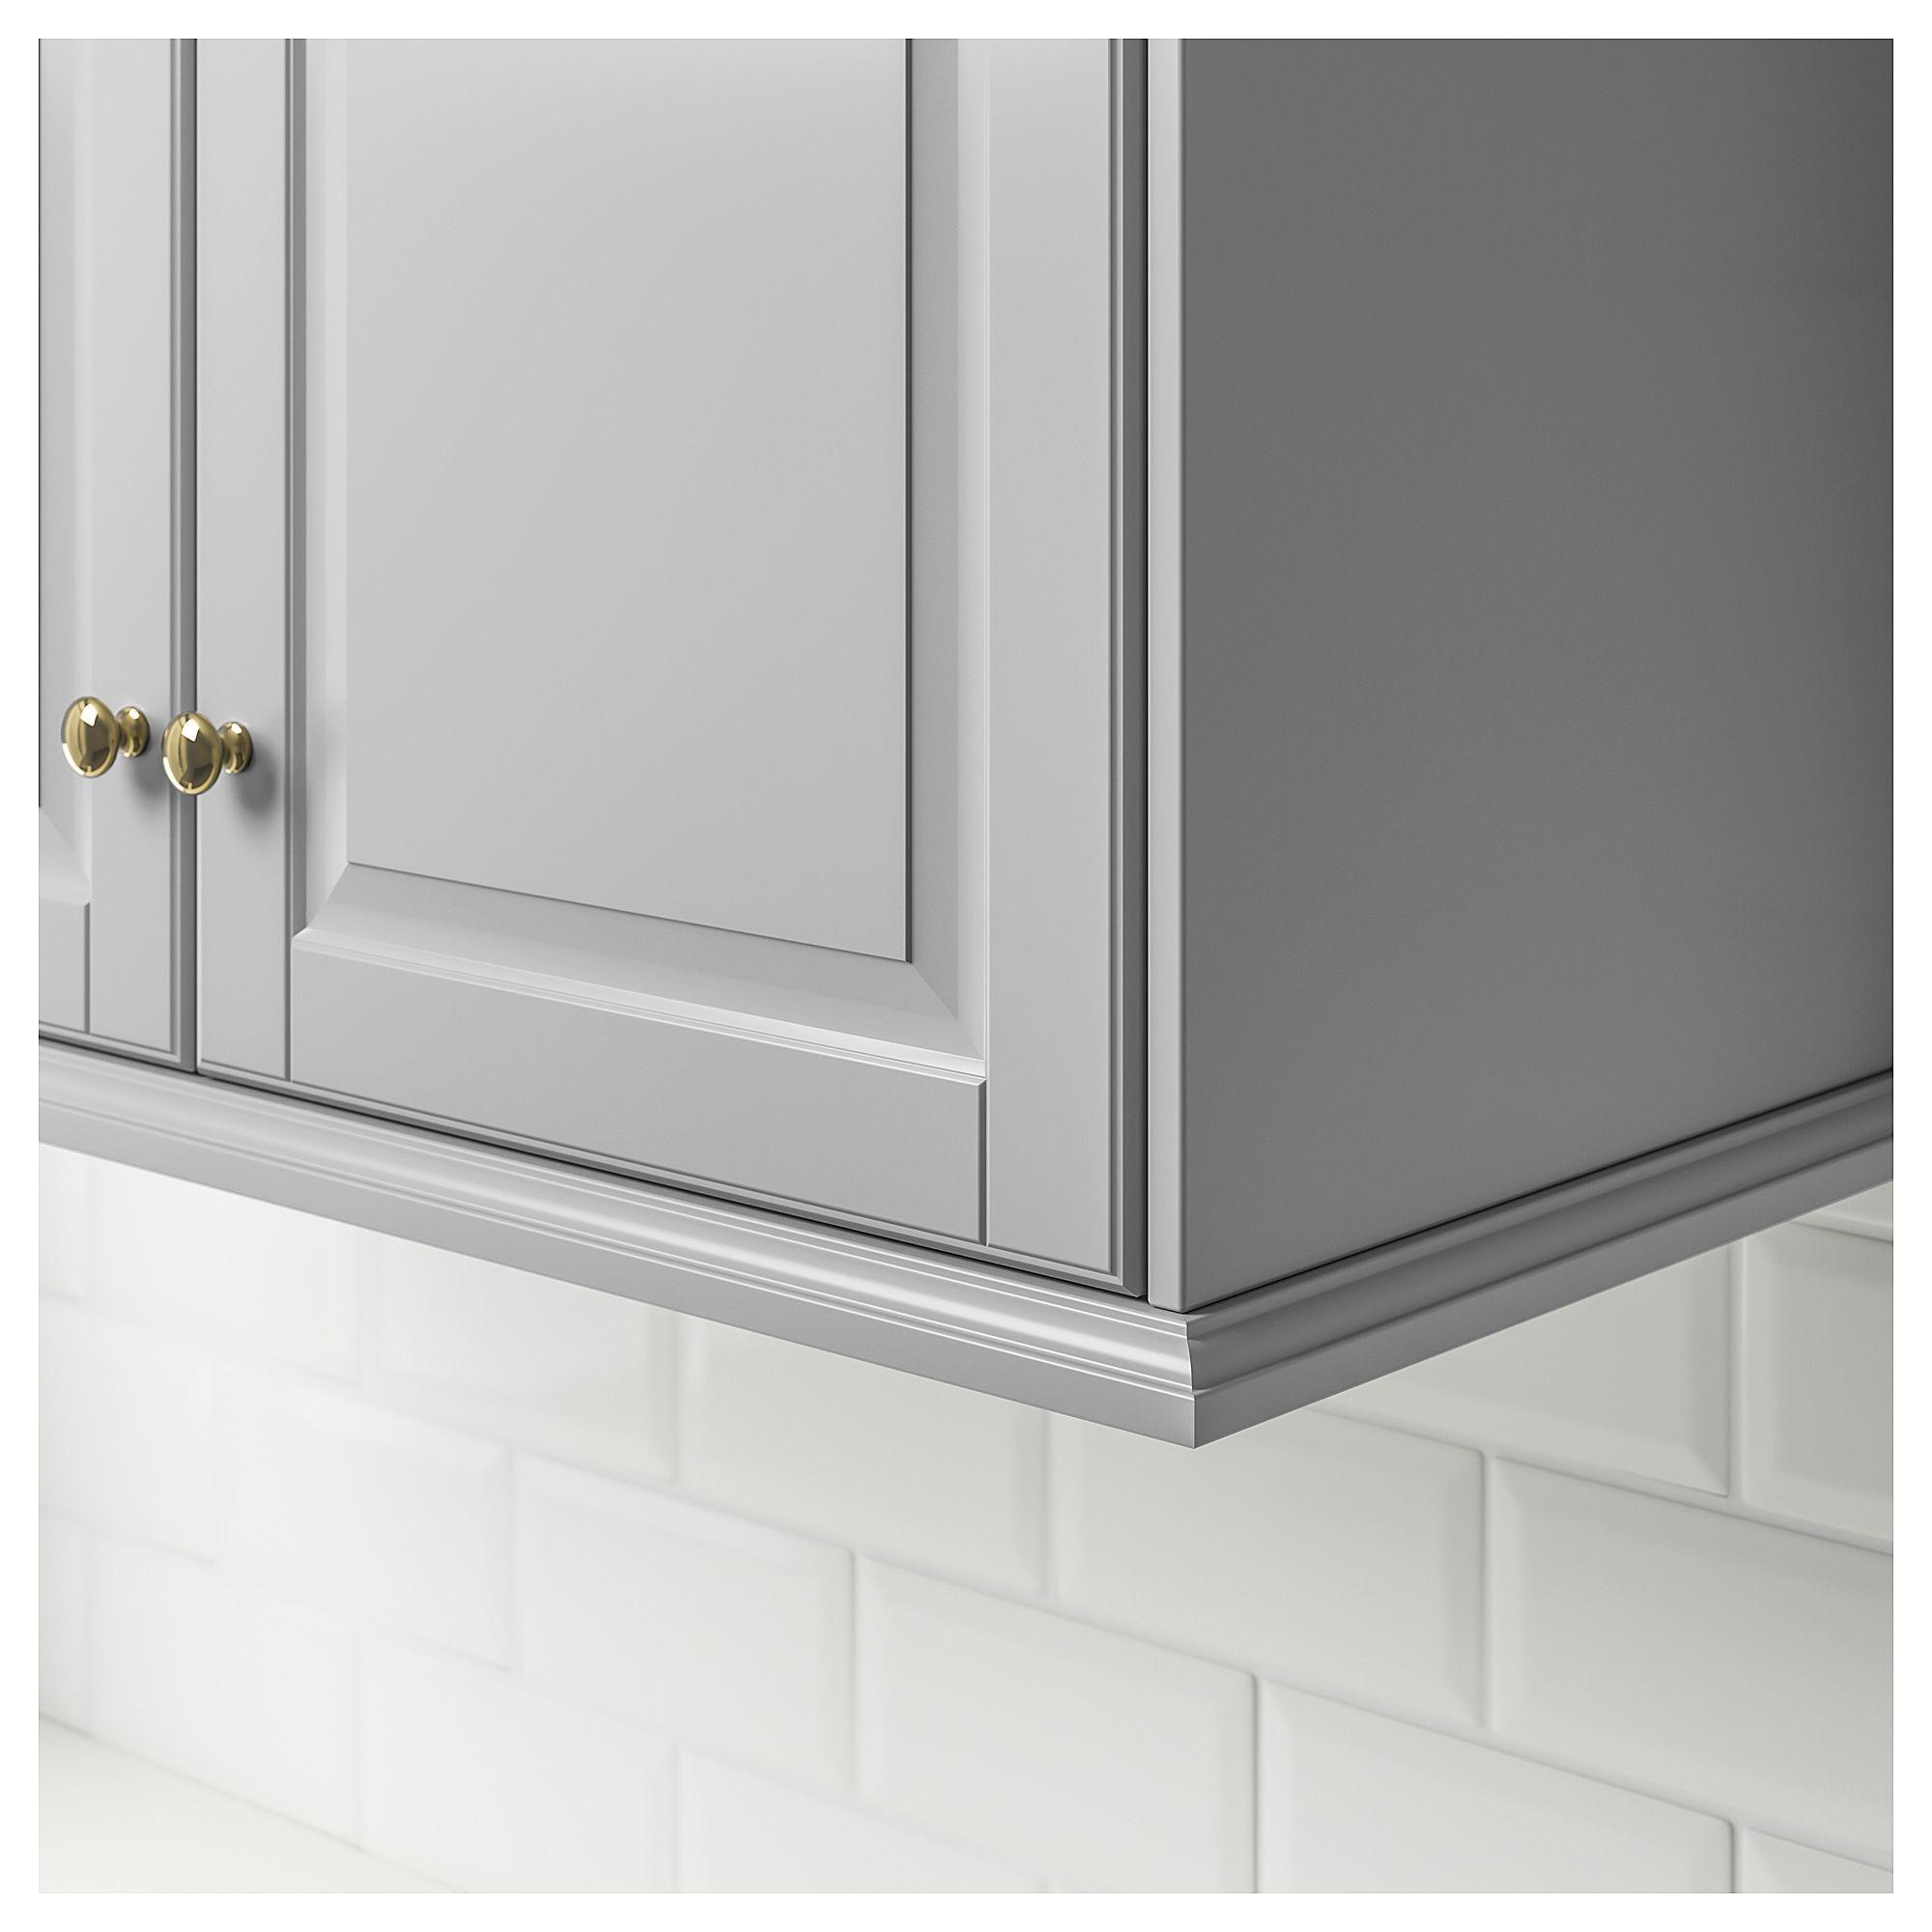 Kitchen Cabinet Cornice: IKEA - BODBYN Contoured Deco Strip/moulding Gray